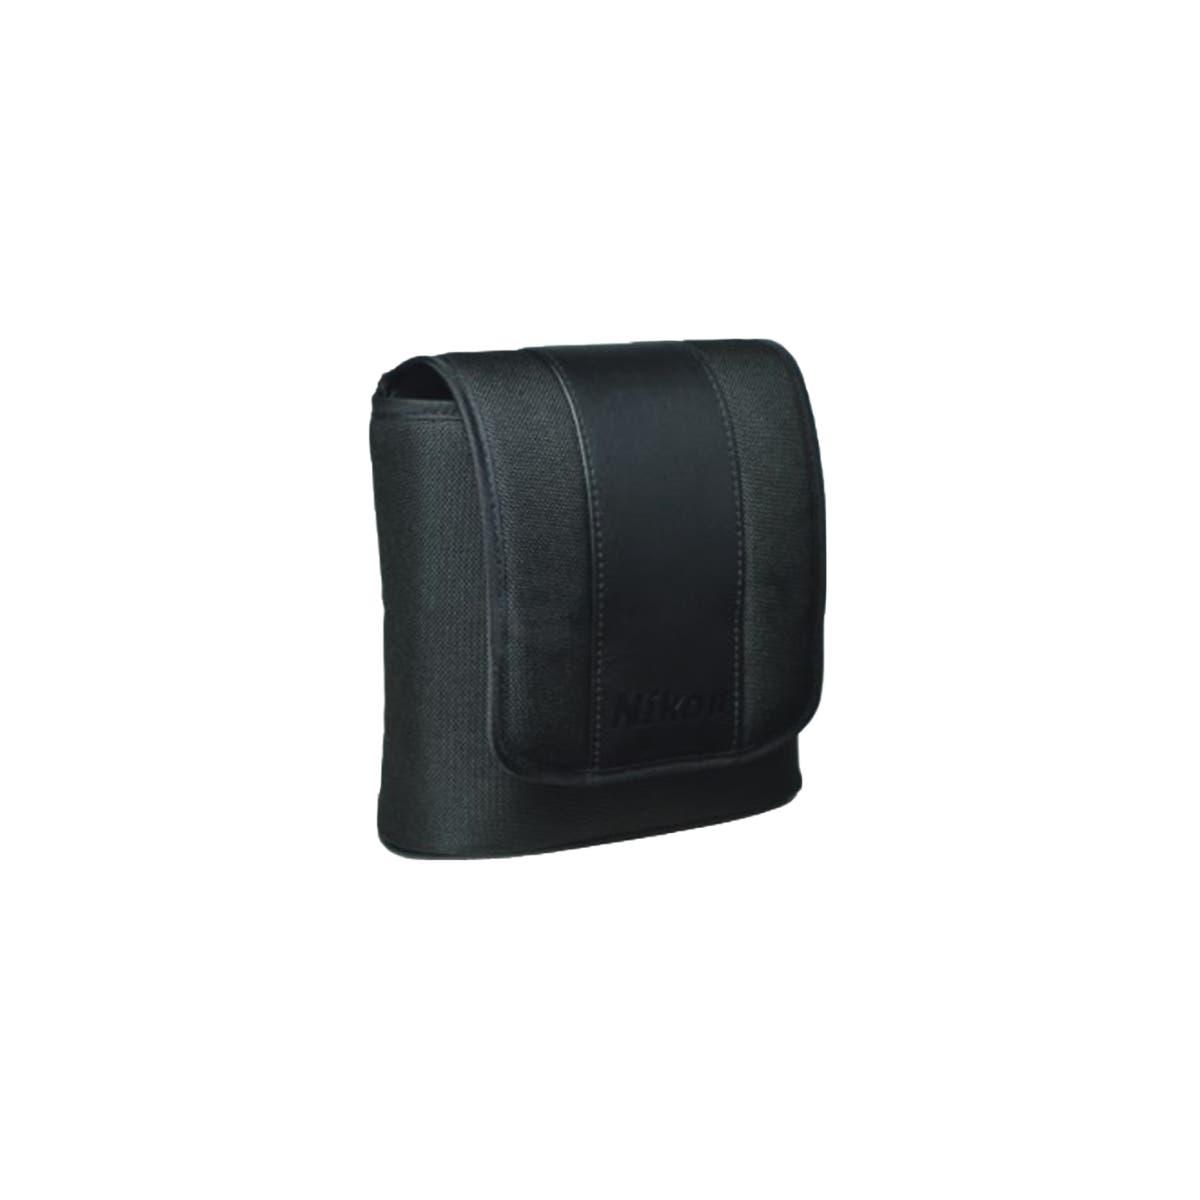 Monarch 30mm case